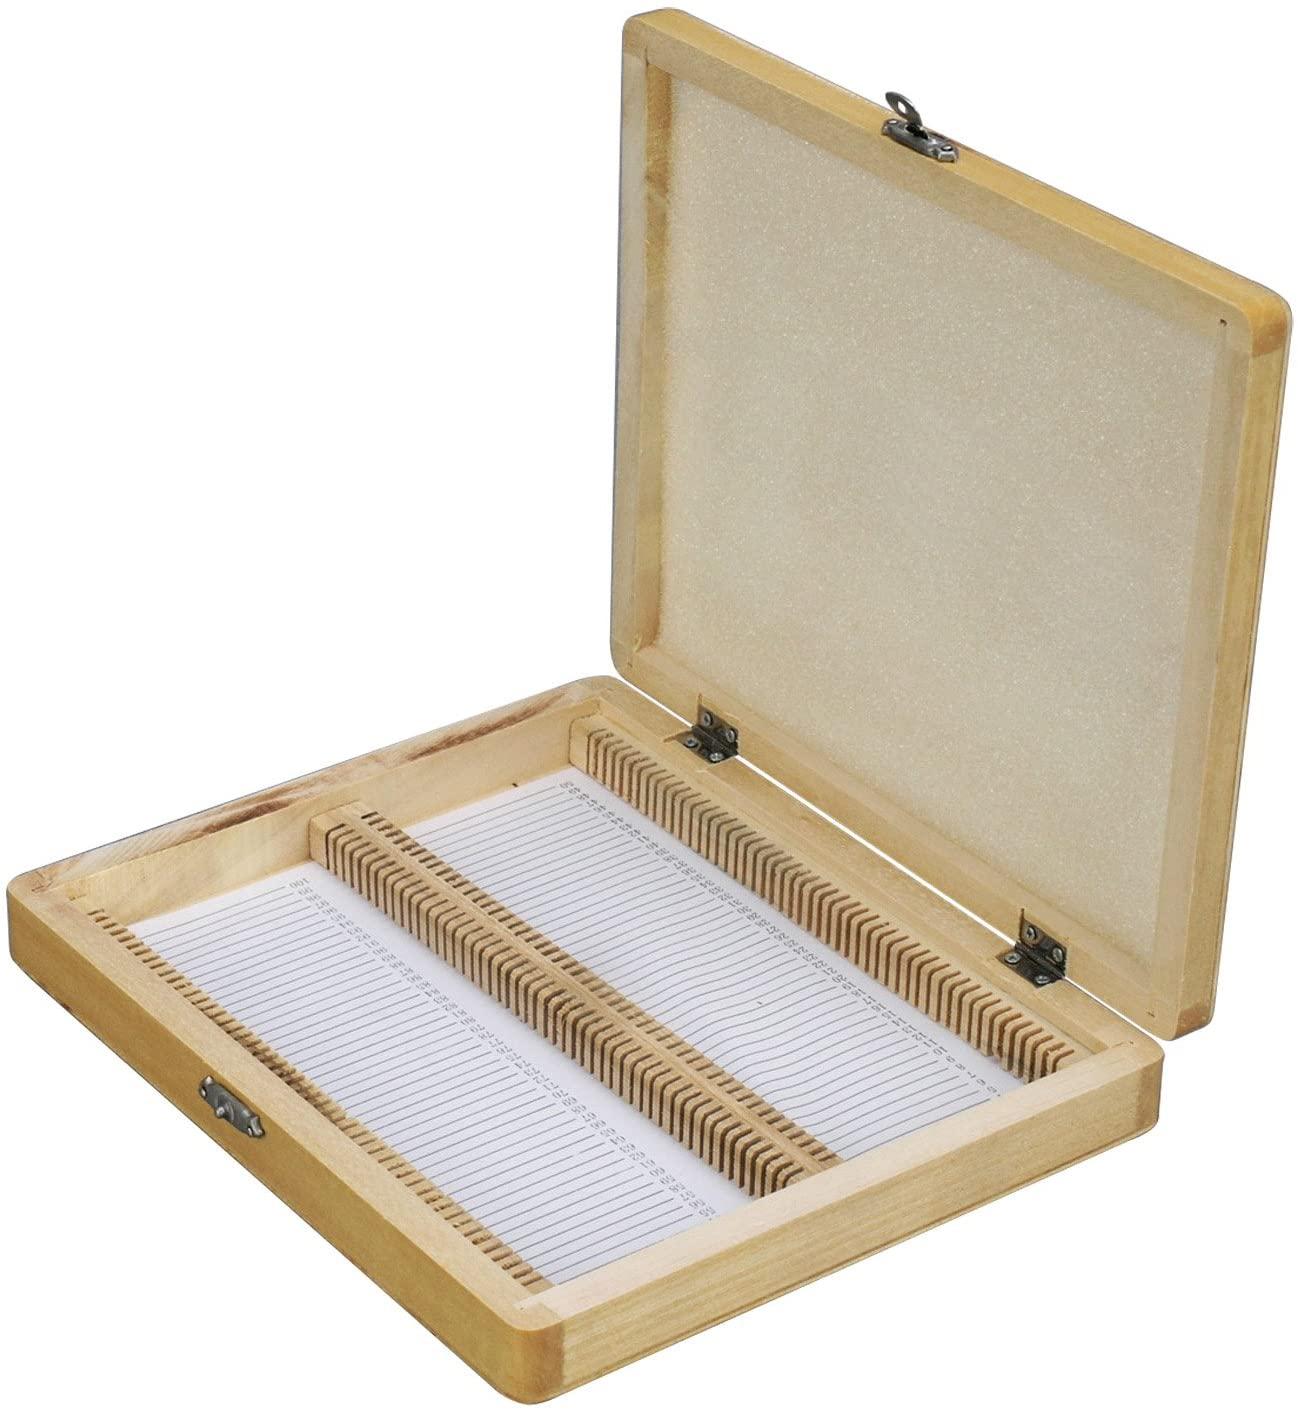 AmScope Microscope Slide Wooden Box Holding 100 Piece Slides